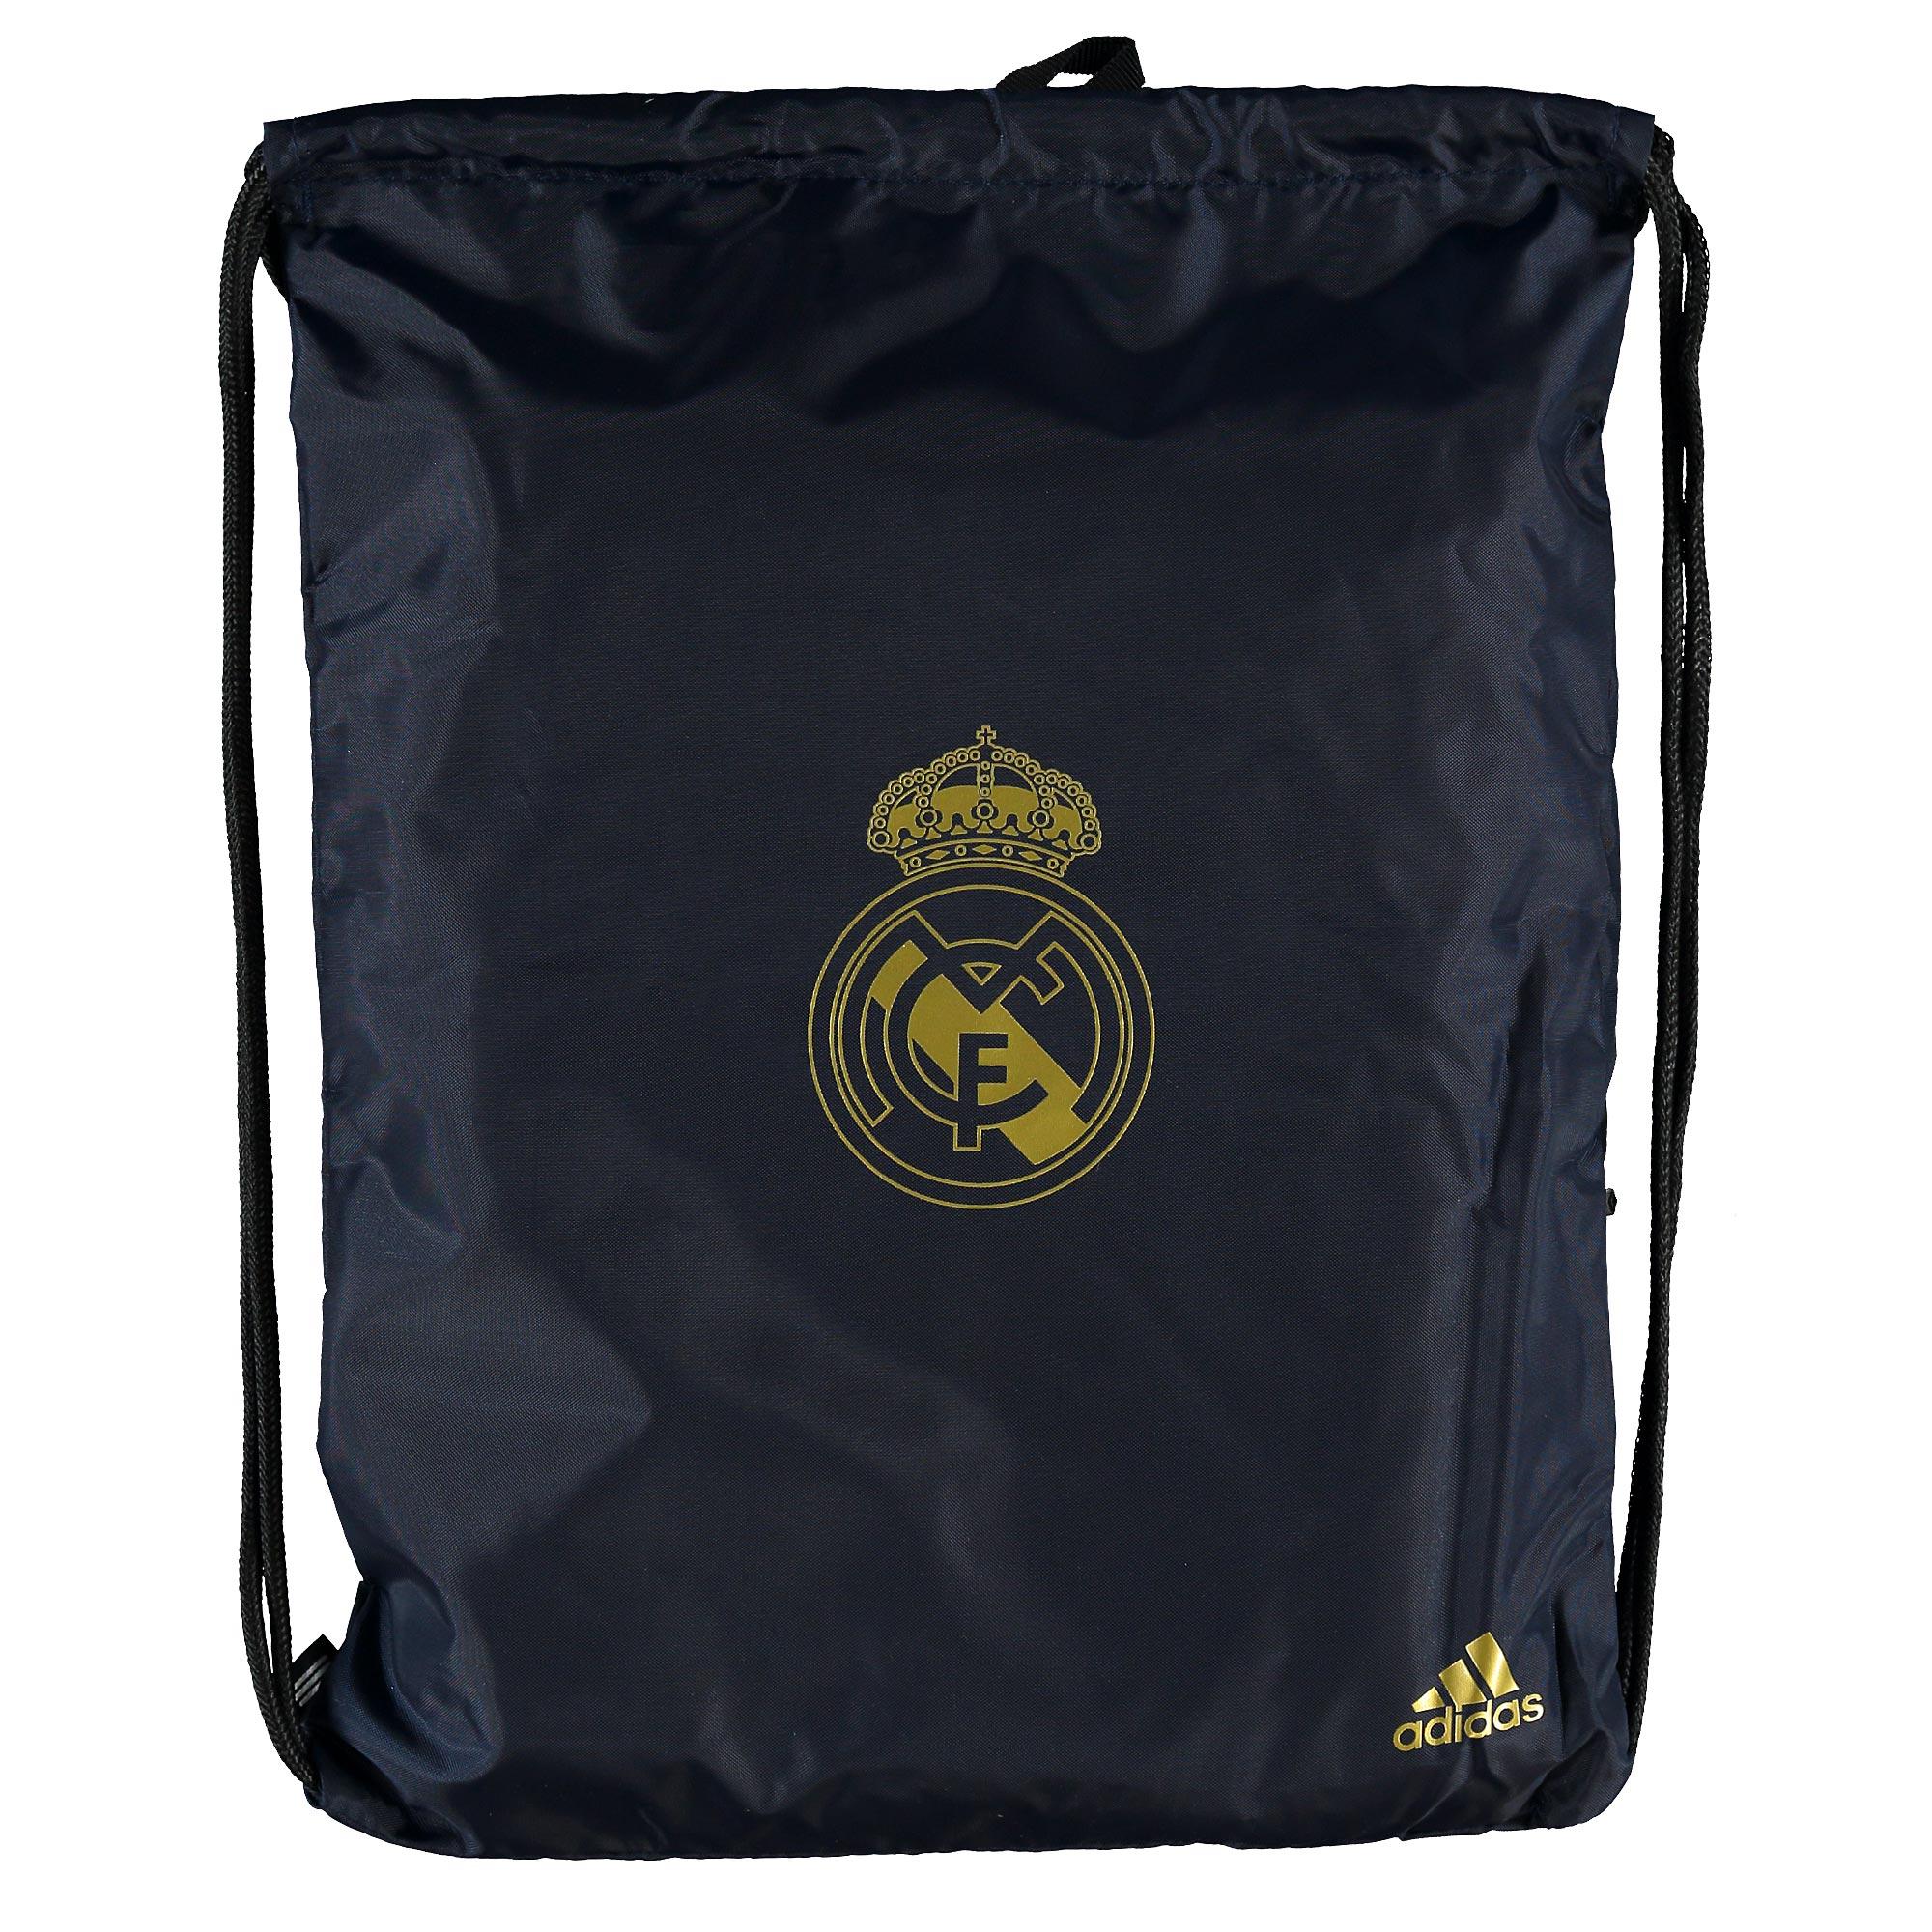 Adidas / Bolsa para el gimnasio del Real Madrid azul marino